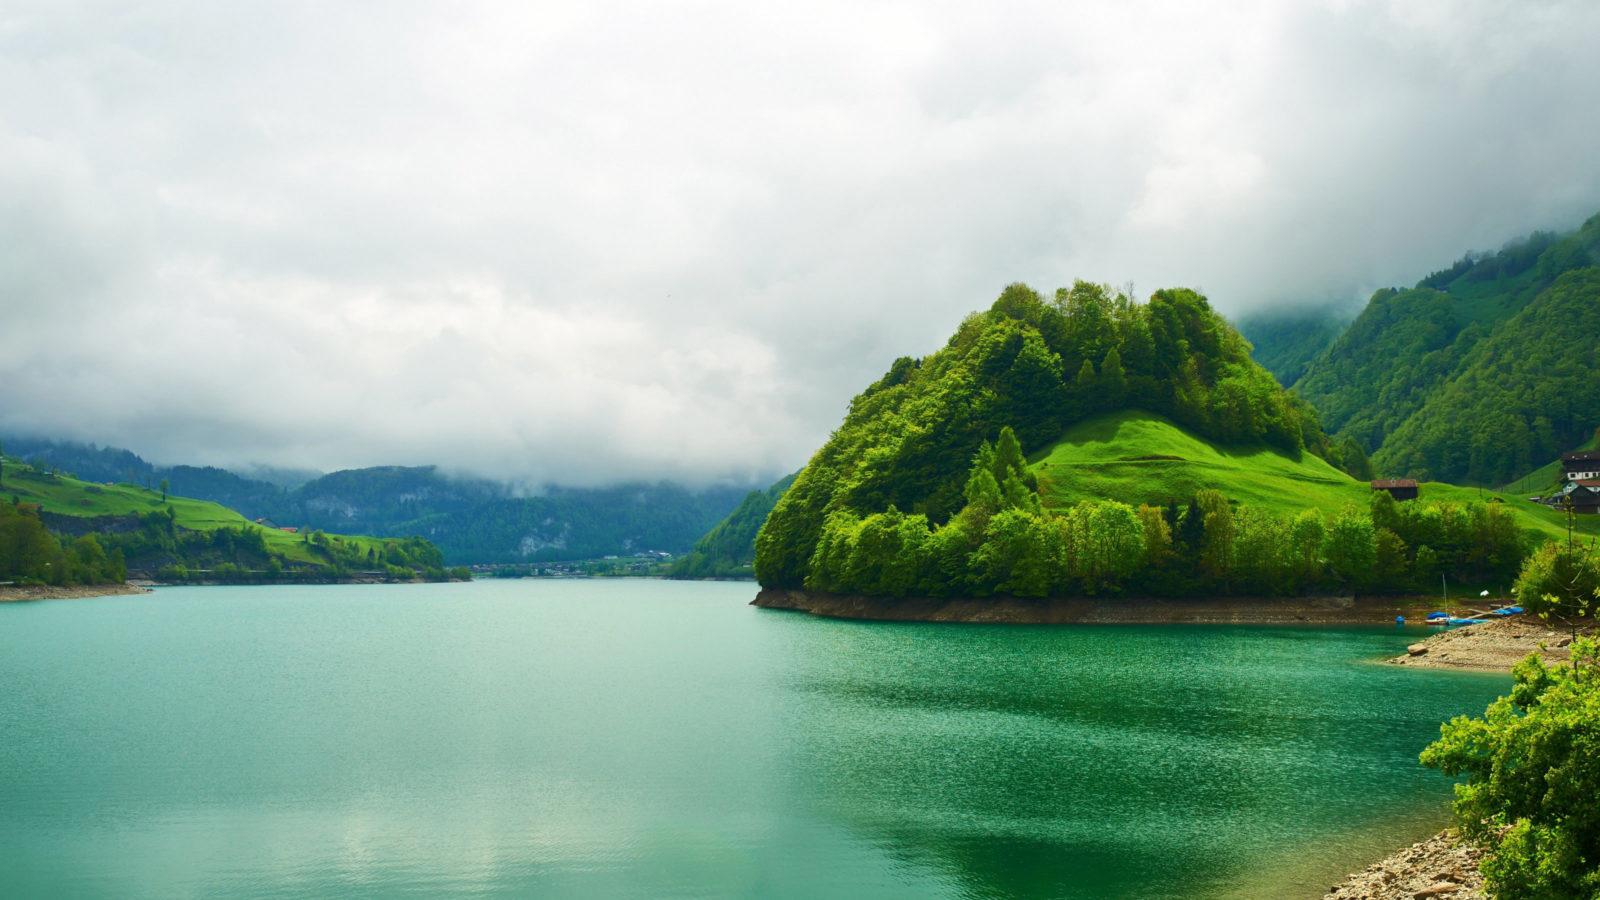 desktop wallpaper picture: 171 Nature Wallpaper Examples For Your Desktop Background